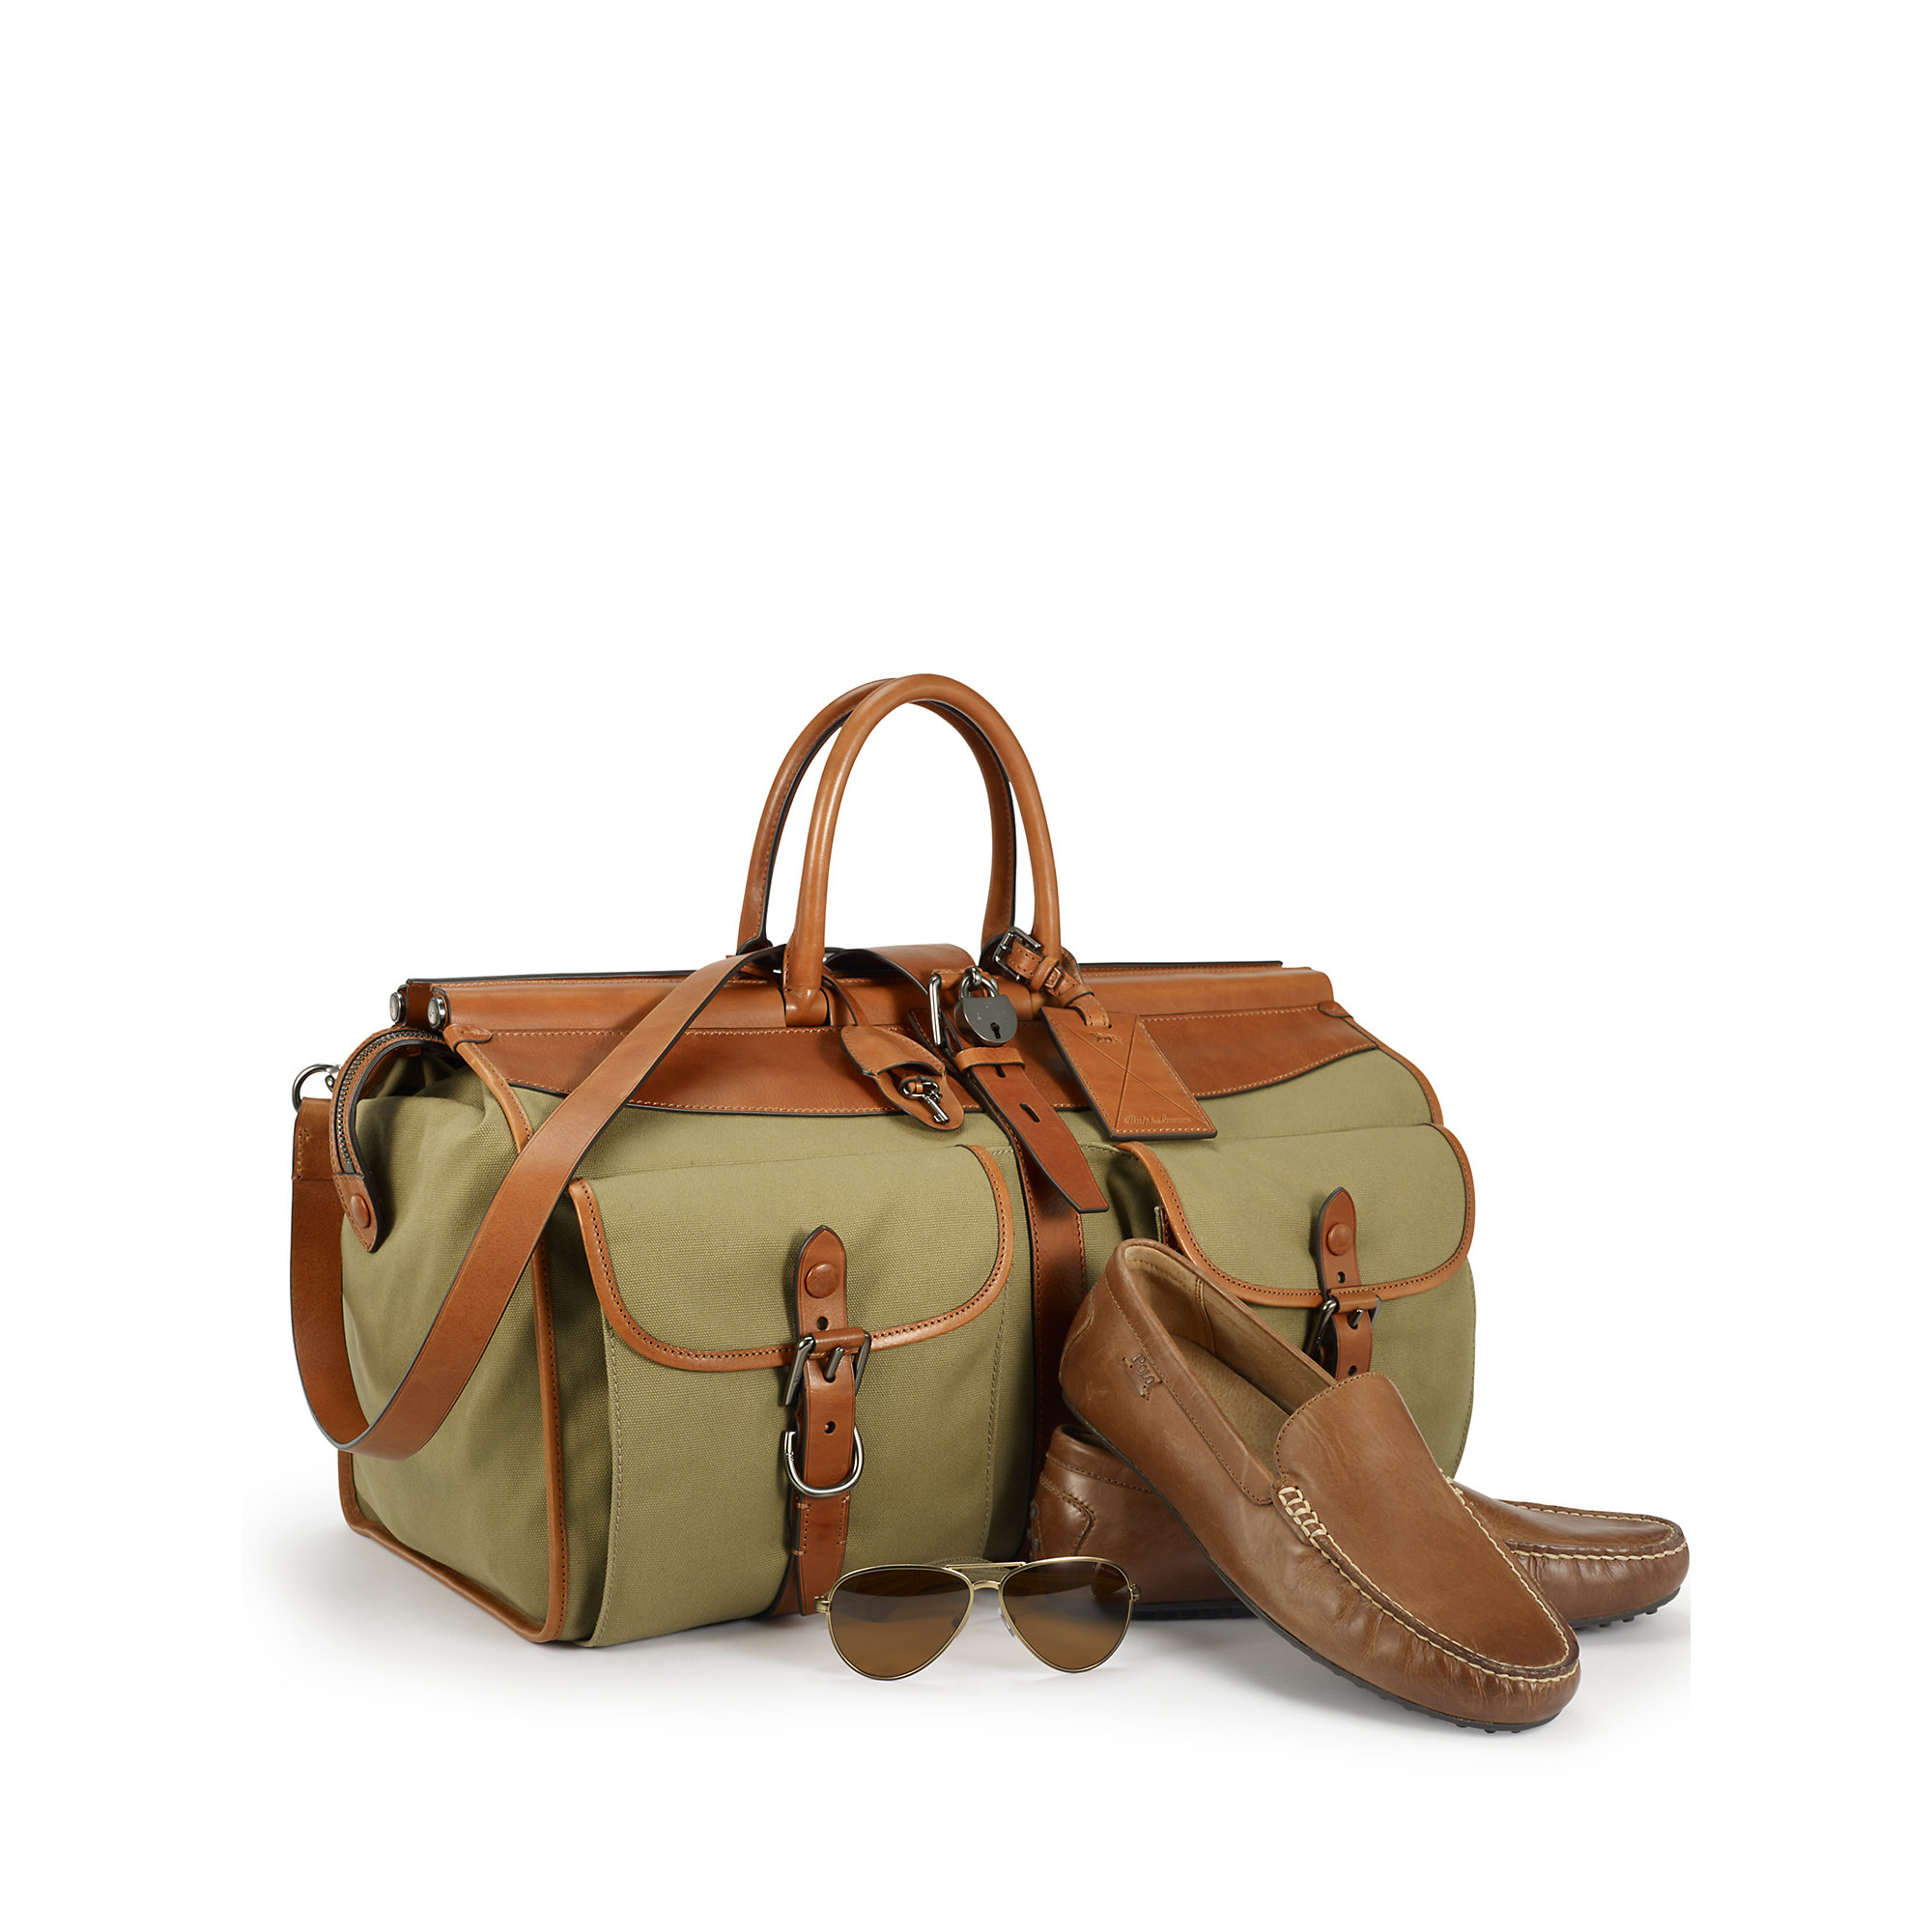 Ralph Lauren Pony Canvas Leather Handbag Rose - Jaimonvoyage.com fa8e099c7e094